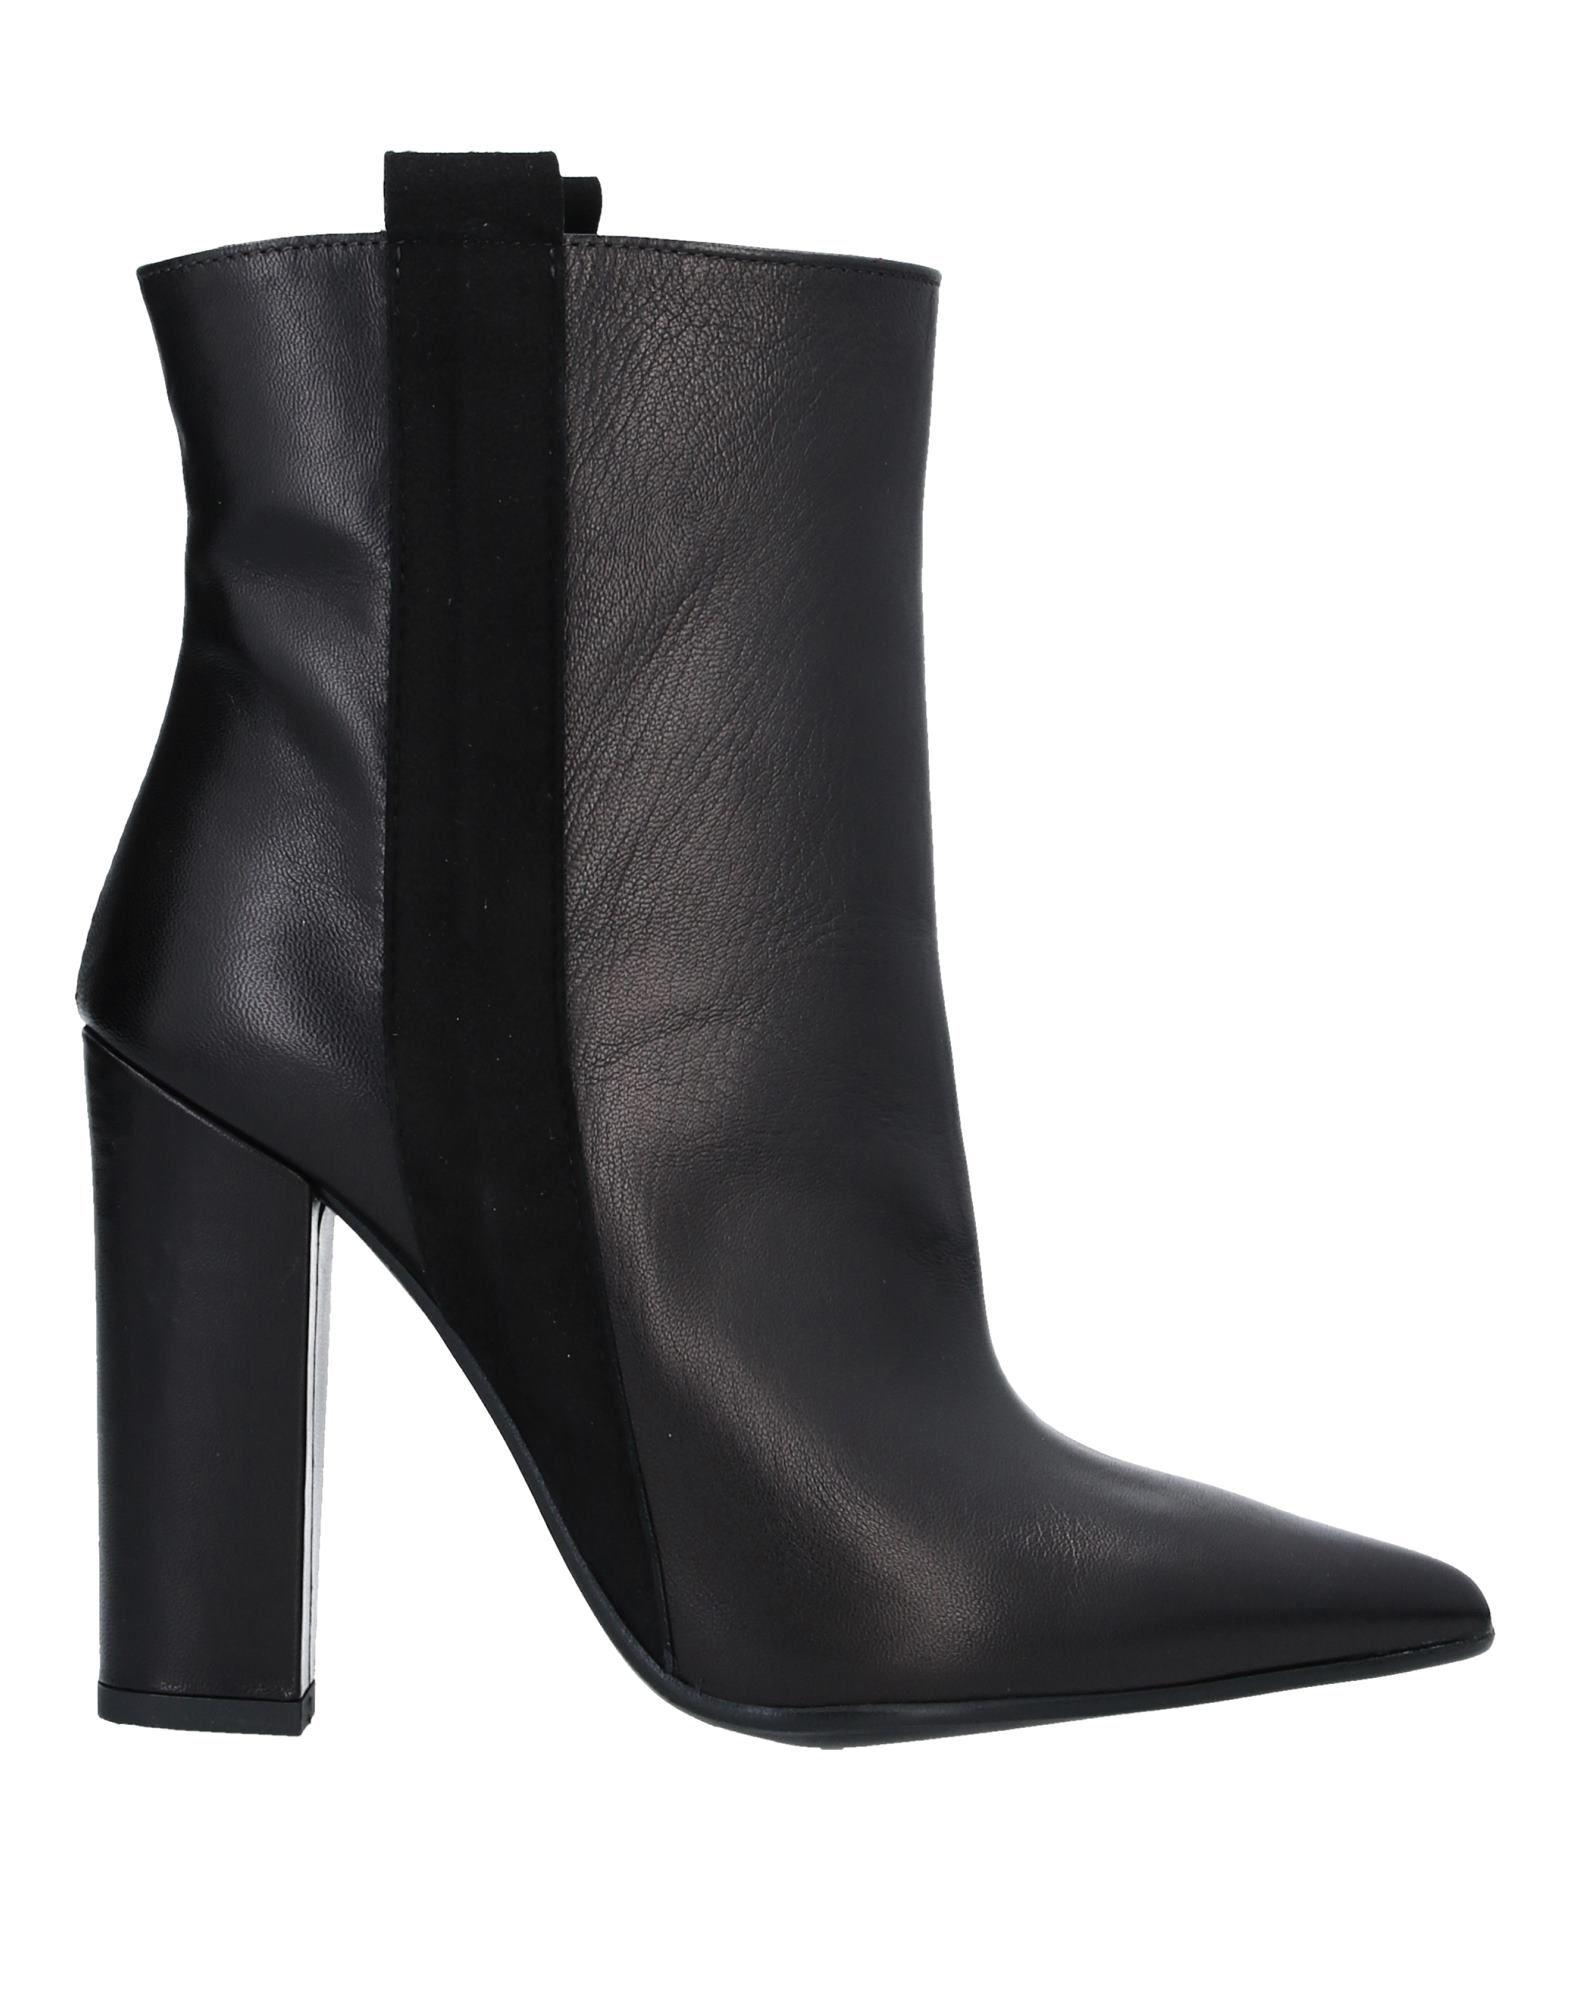 ESTELLE Полусапоги и высокие ботинки estelle полусапоги и высокие ботинки